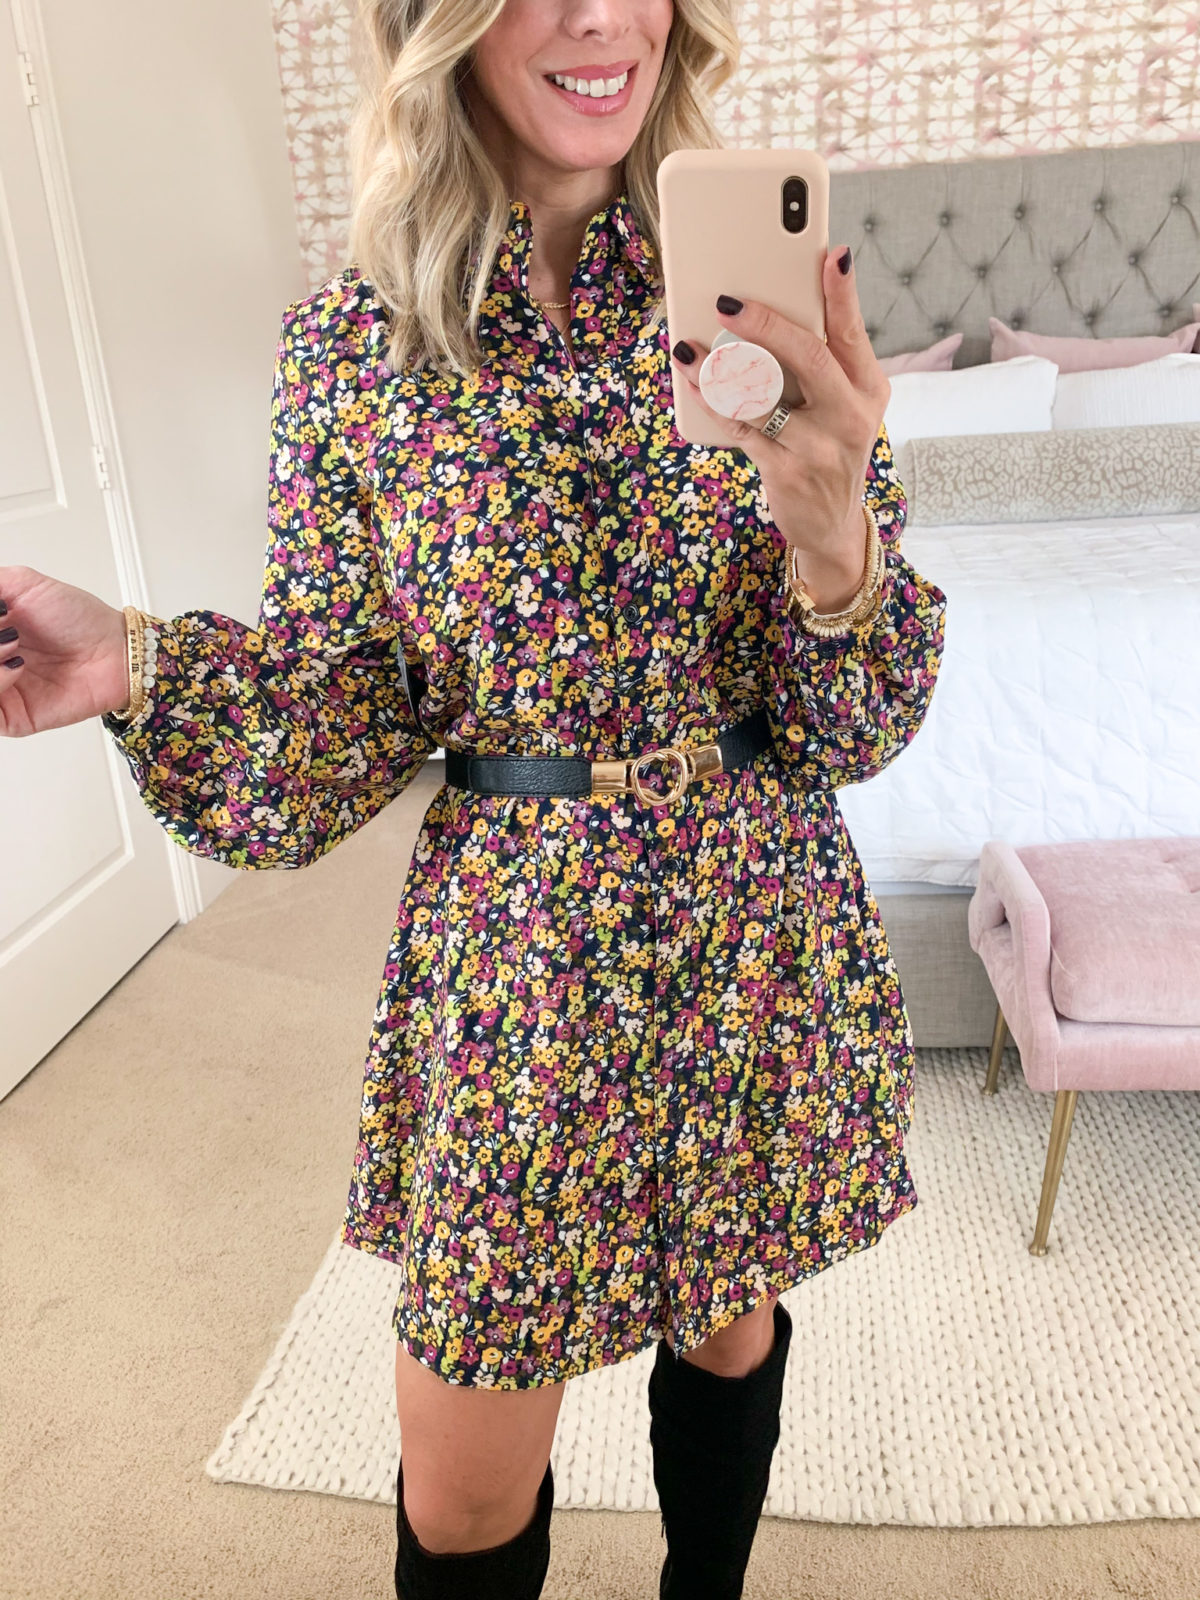 Walmart Fashion, Floral Shift Dress, Belt, Boots